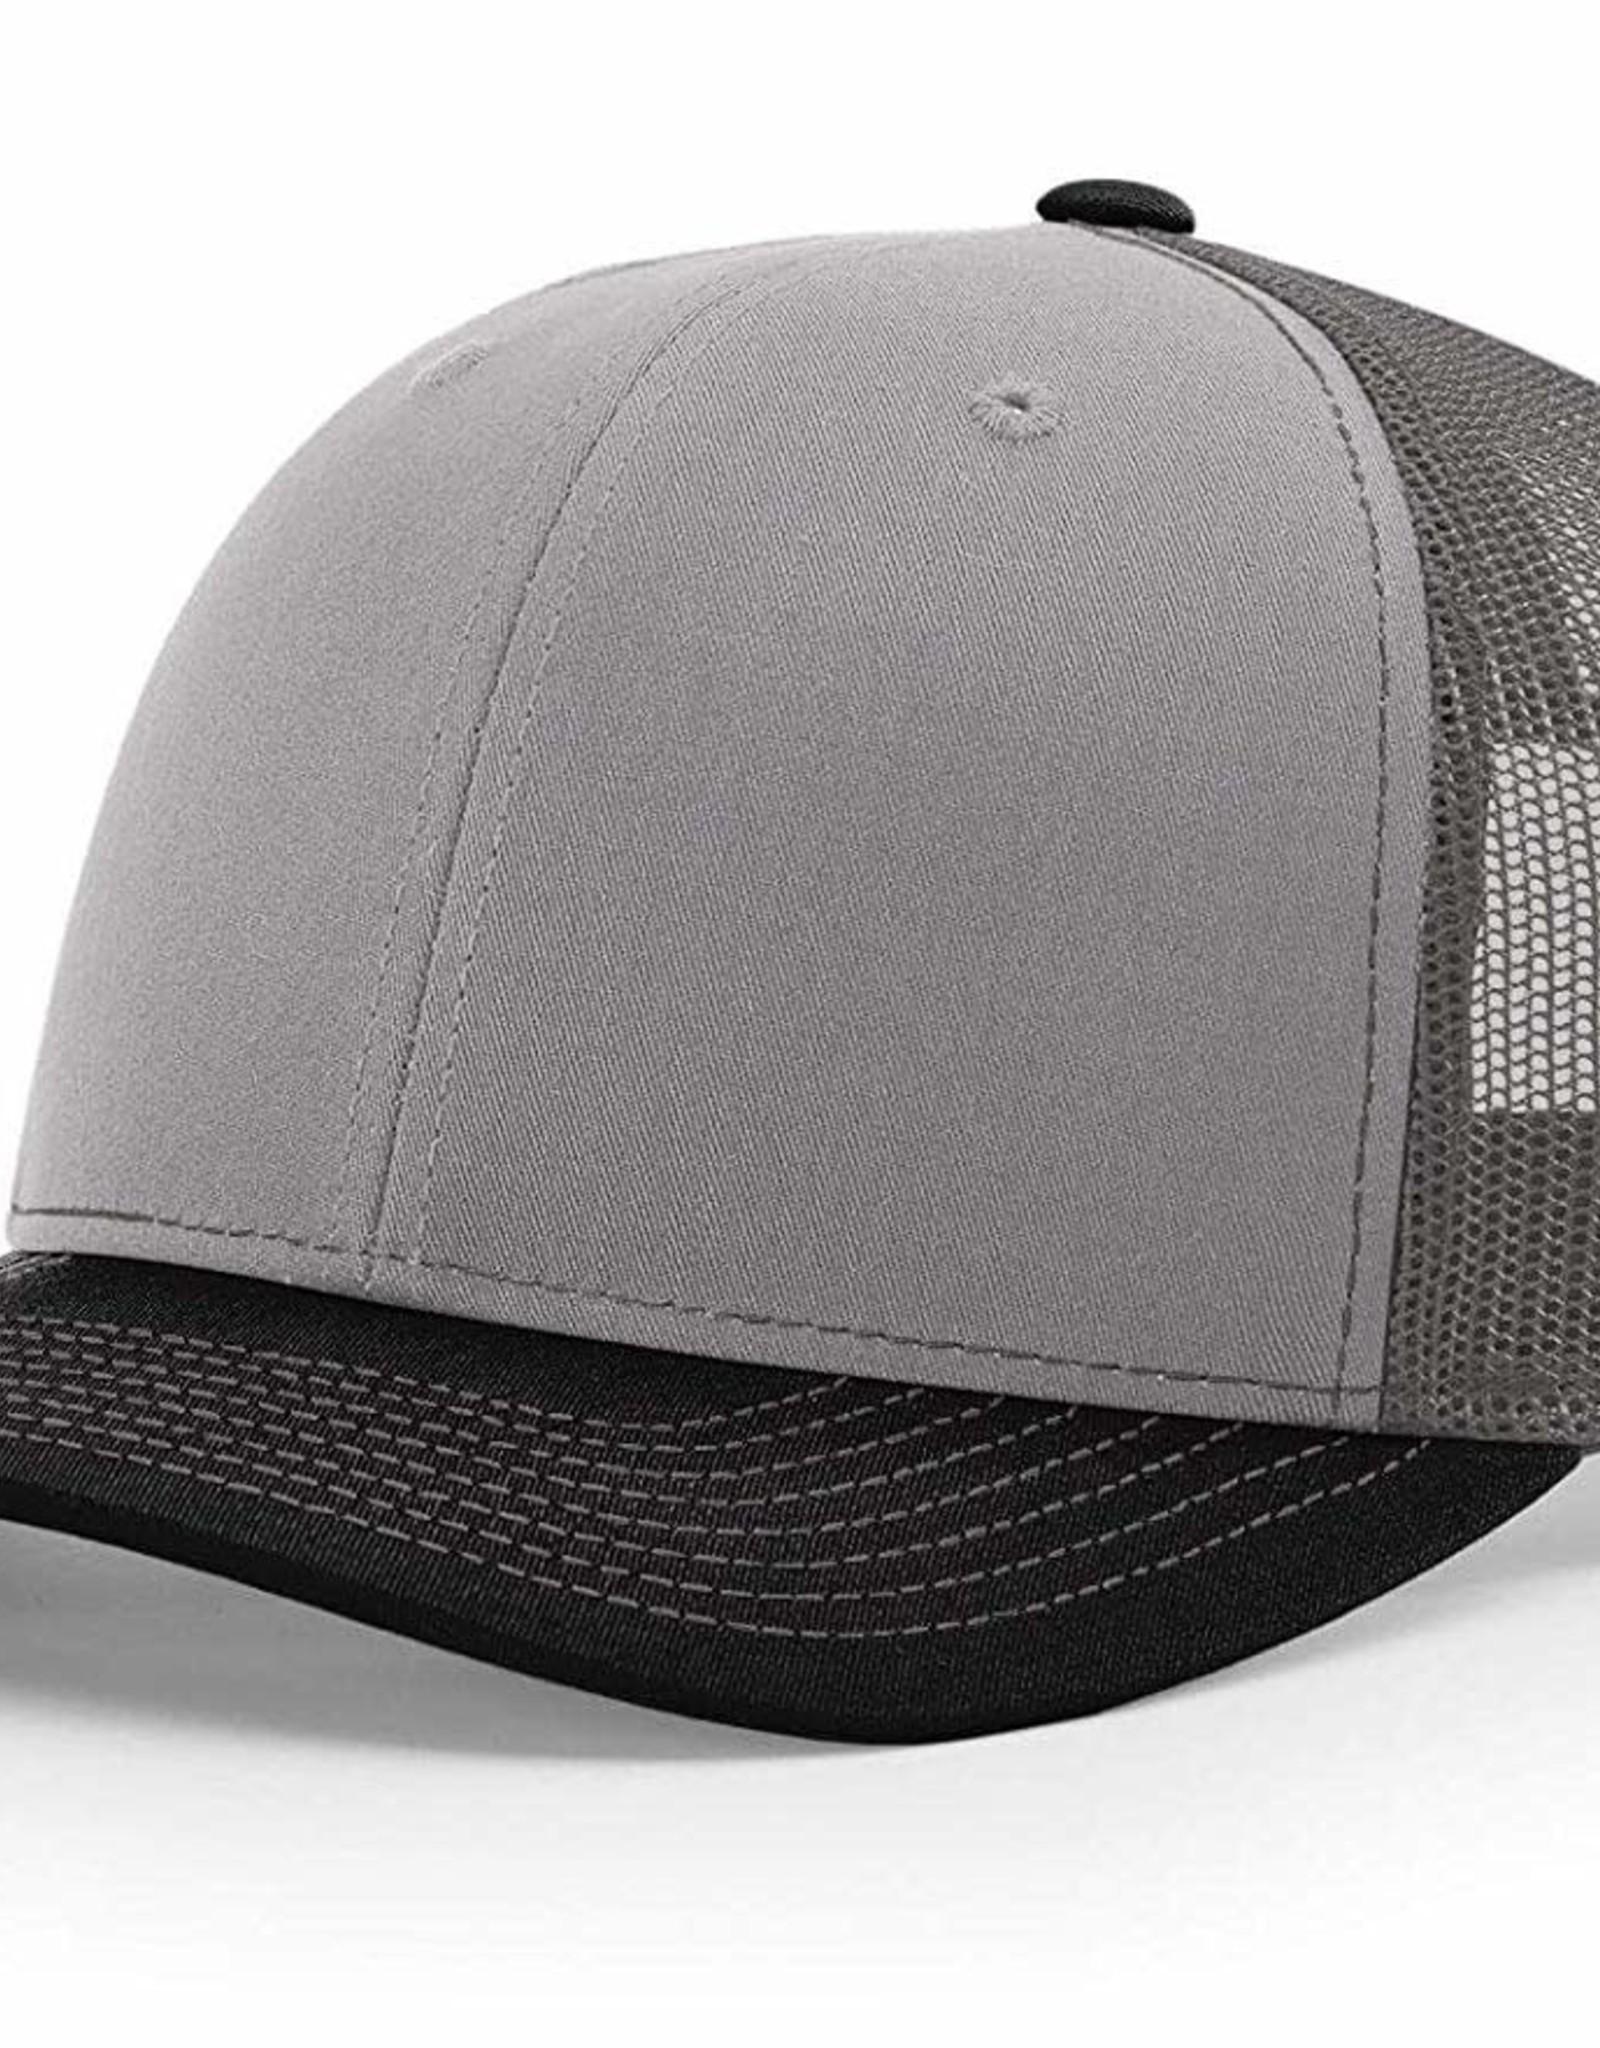 RICHARDSON 112 TRUCKER CAP